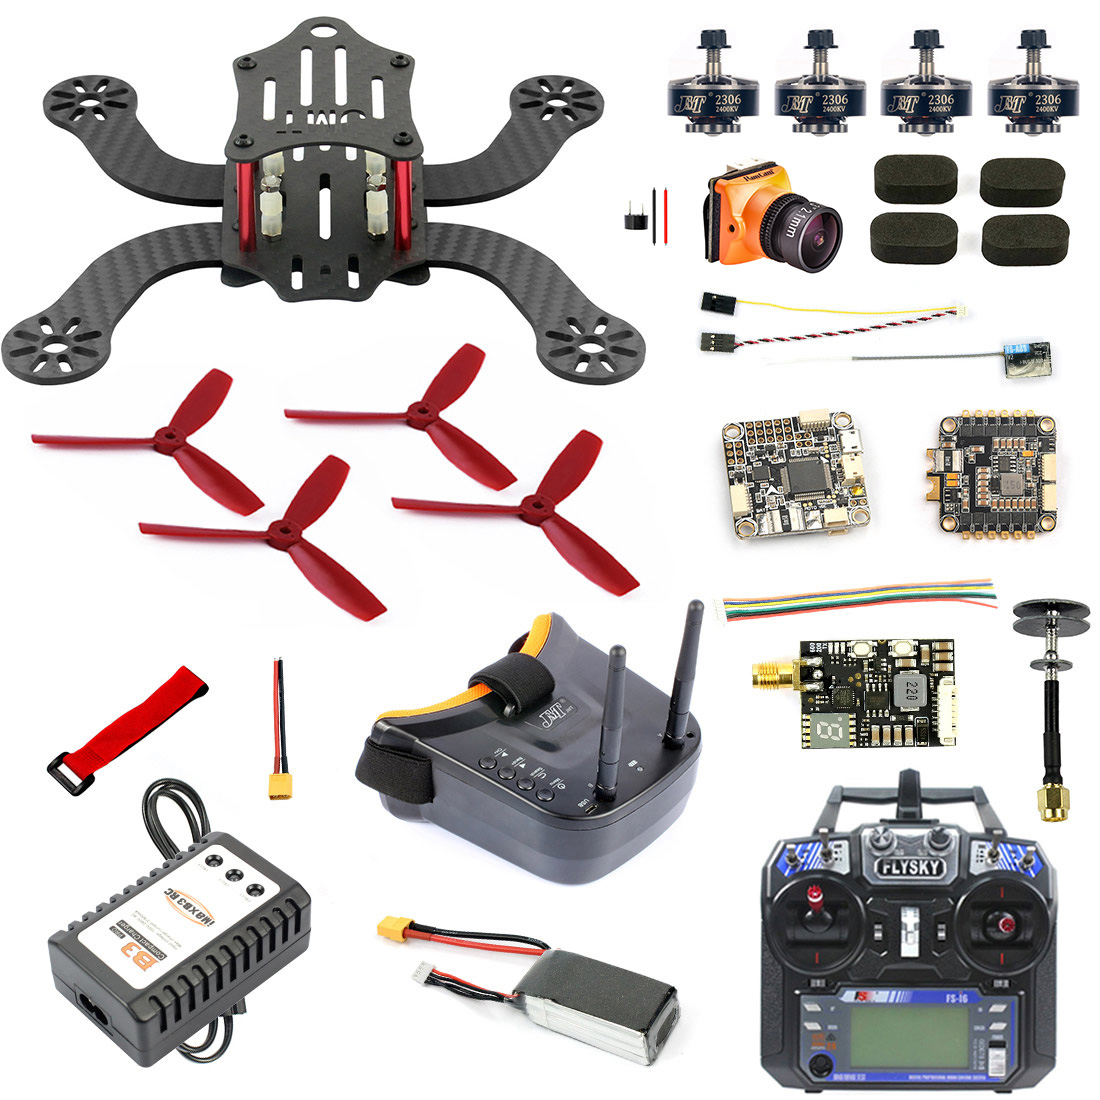 194mm Mini F4 Pro OSD RC FPV Racing Drone Quadcopter mit 4 in 1 30A ESC RunCam 600TVL/ 700TVL BNF RTF-in RC-Hubschrauber aus Spielzeug und Hobbys bei  Gruppe 1